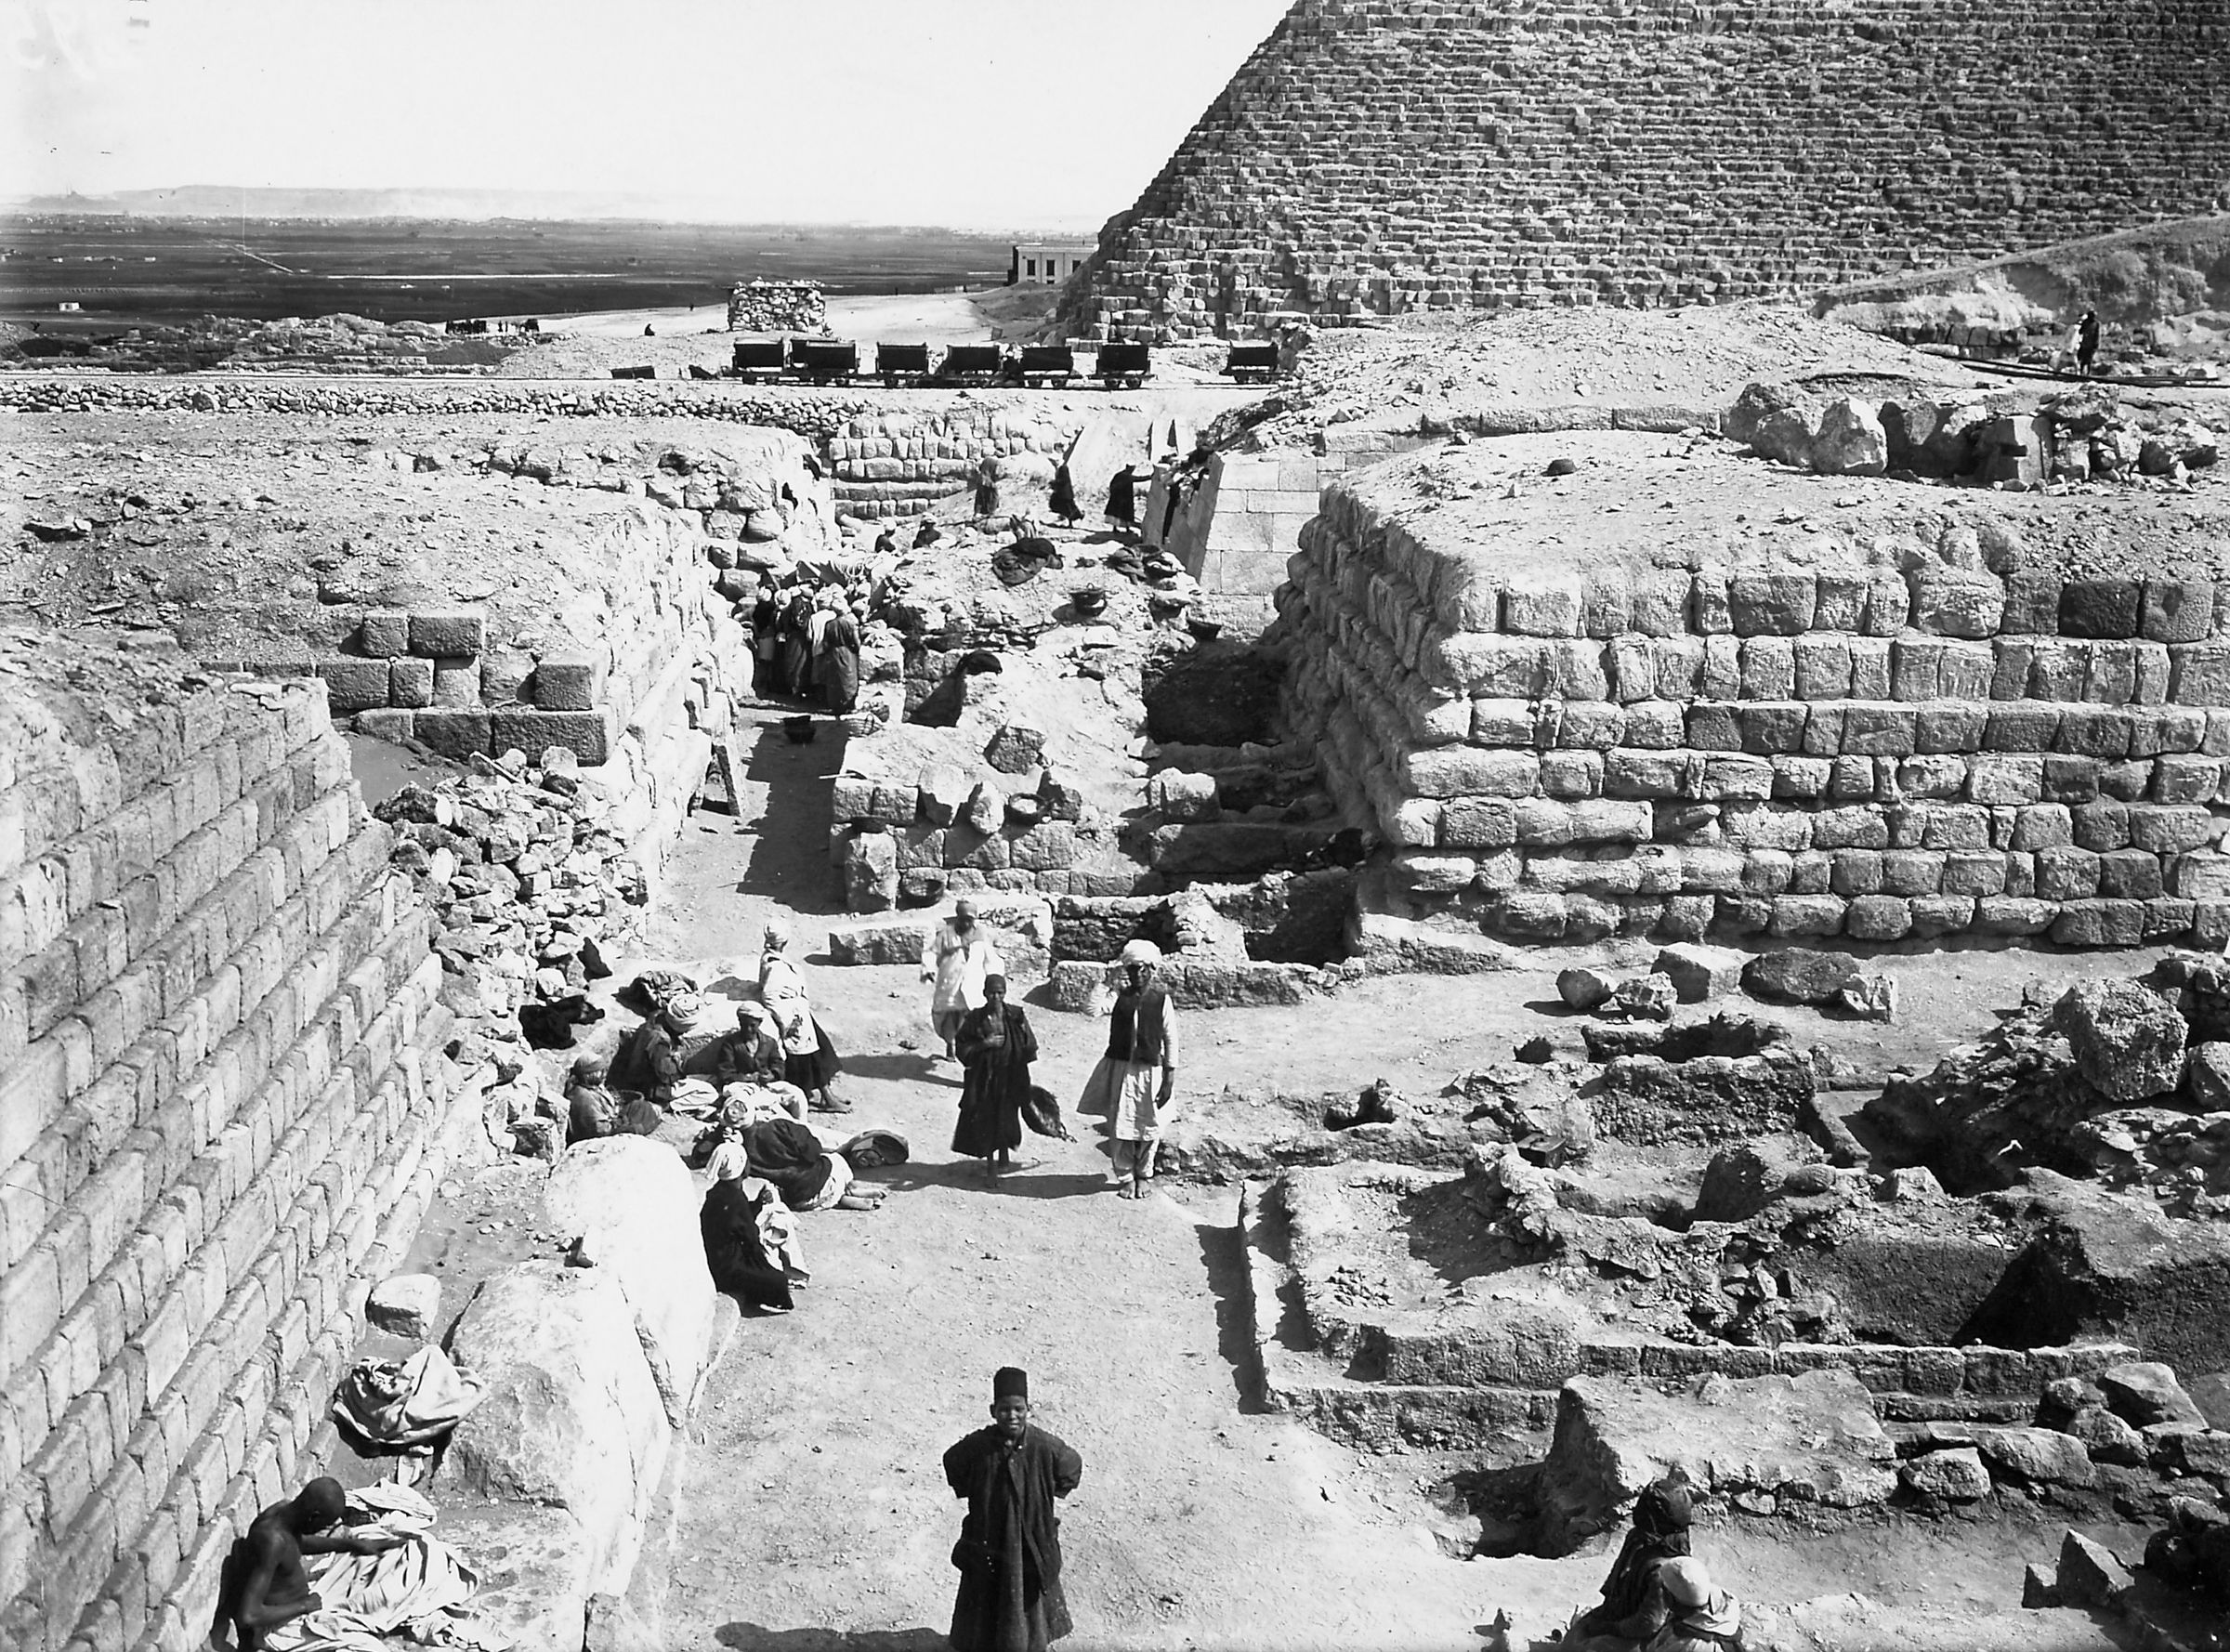 Western Cemetery: Site: Giza; View: G 2140, G 2135, Nimaatre (G 2136b), G 2136, G 2120, Neferihi